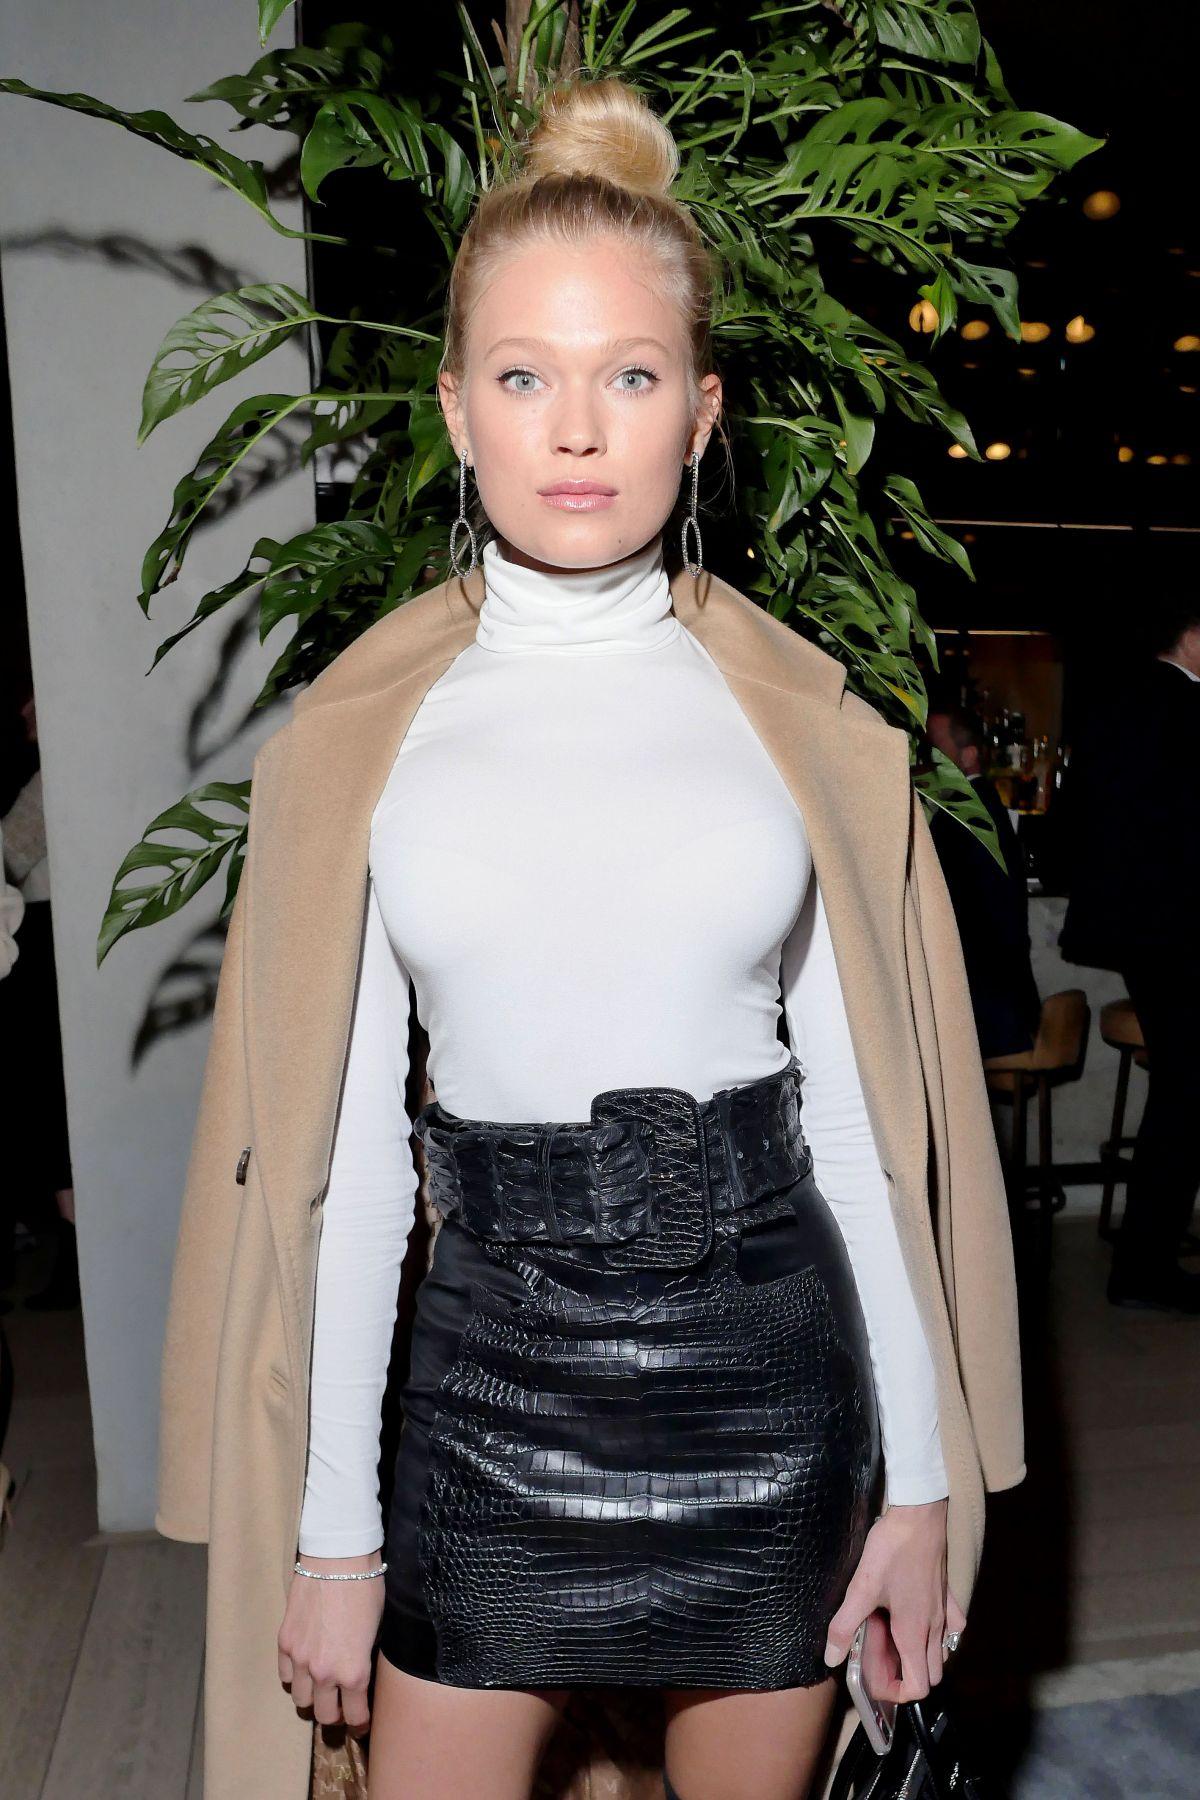 VITA SIDORKINA at Moncler Grenoble Fashion Show in New York 02/14/2017